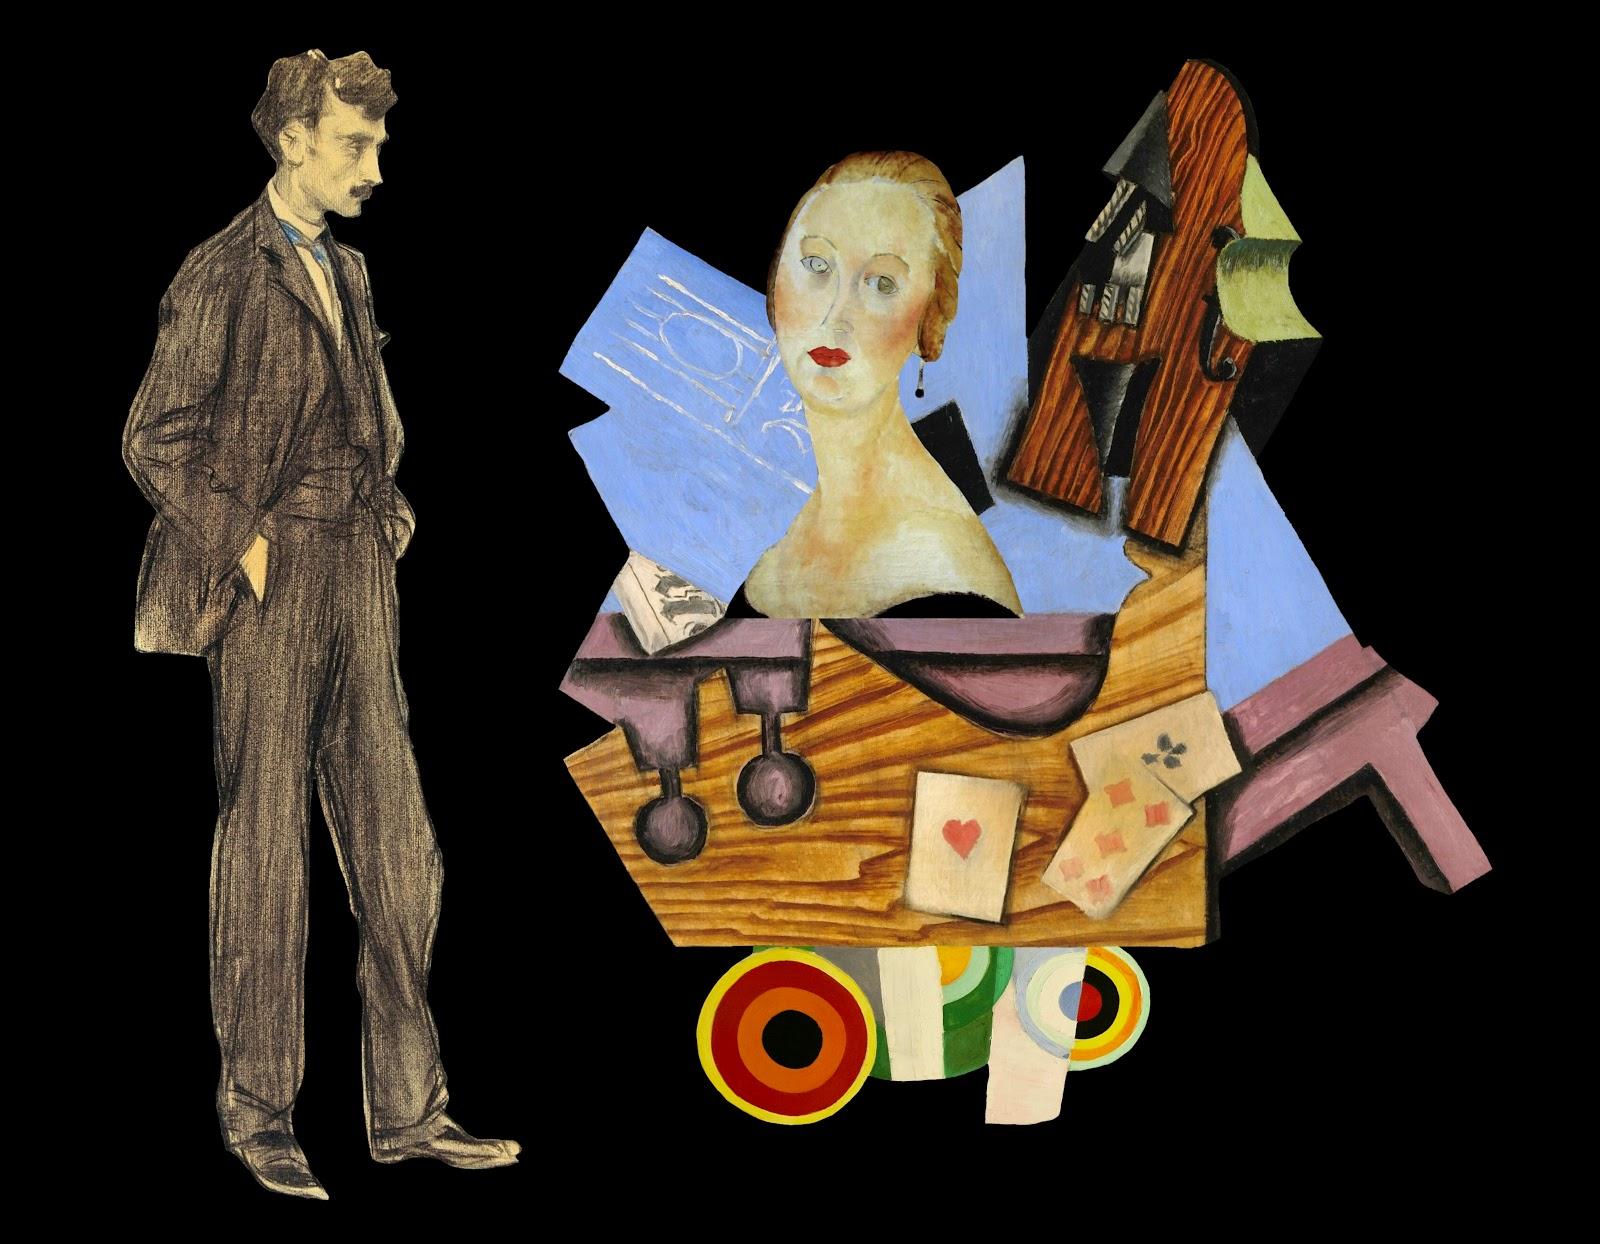 http://fineartamerica.com/featured/mans-companion-laura-botsford.html